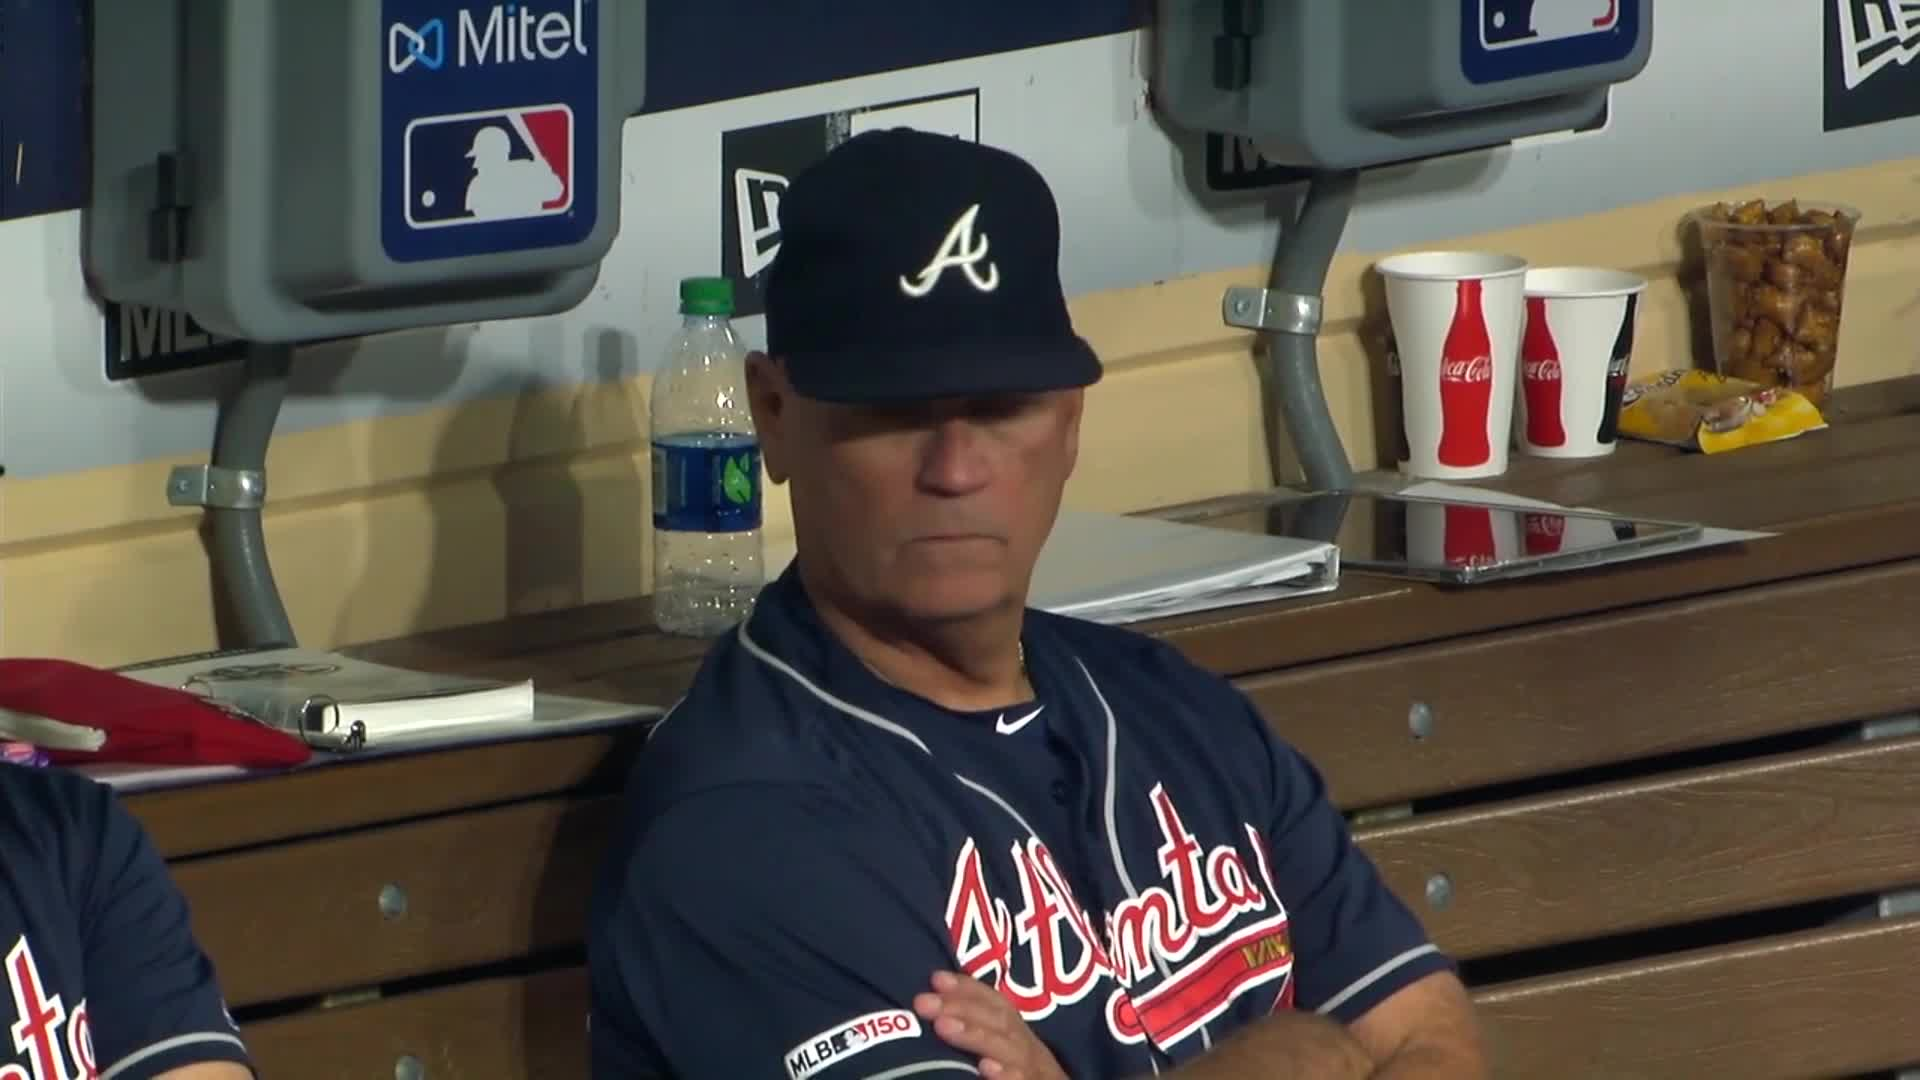 atlanta, baseball, braves, Snitker saying what and making funny face. GIFs